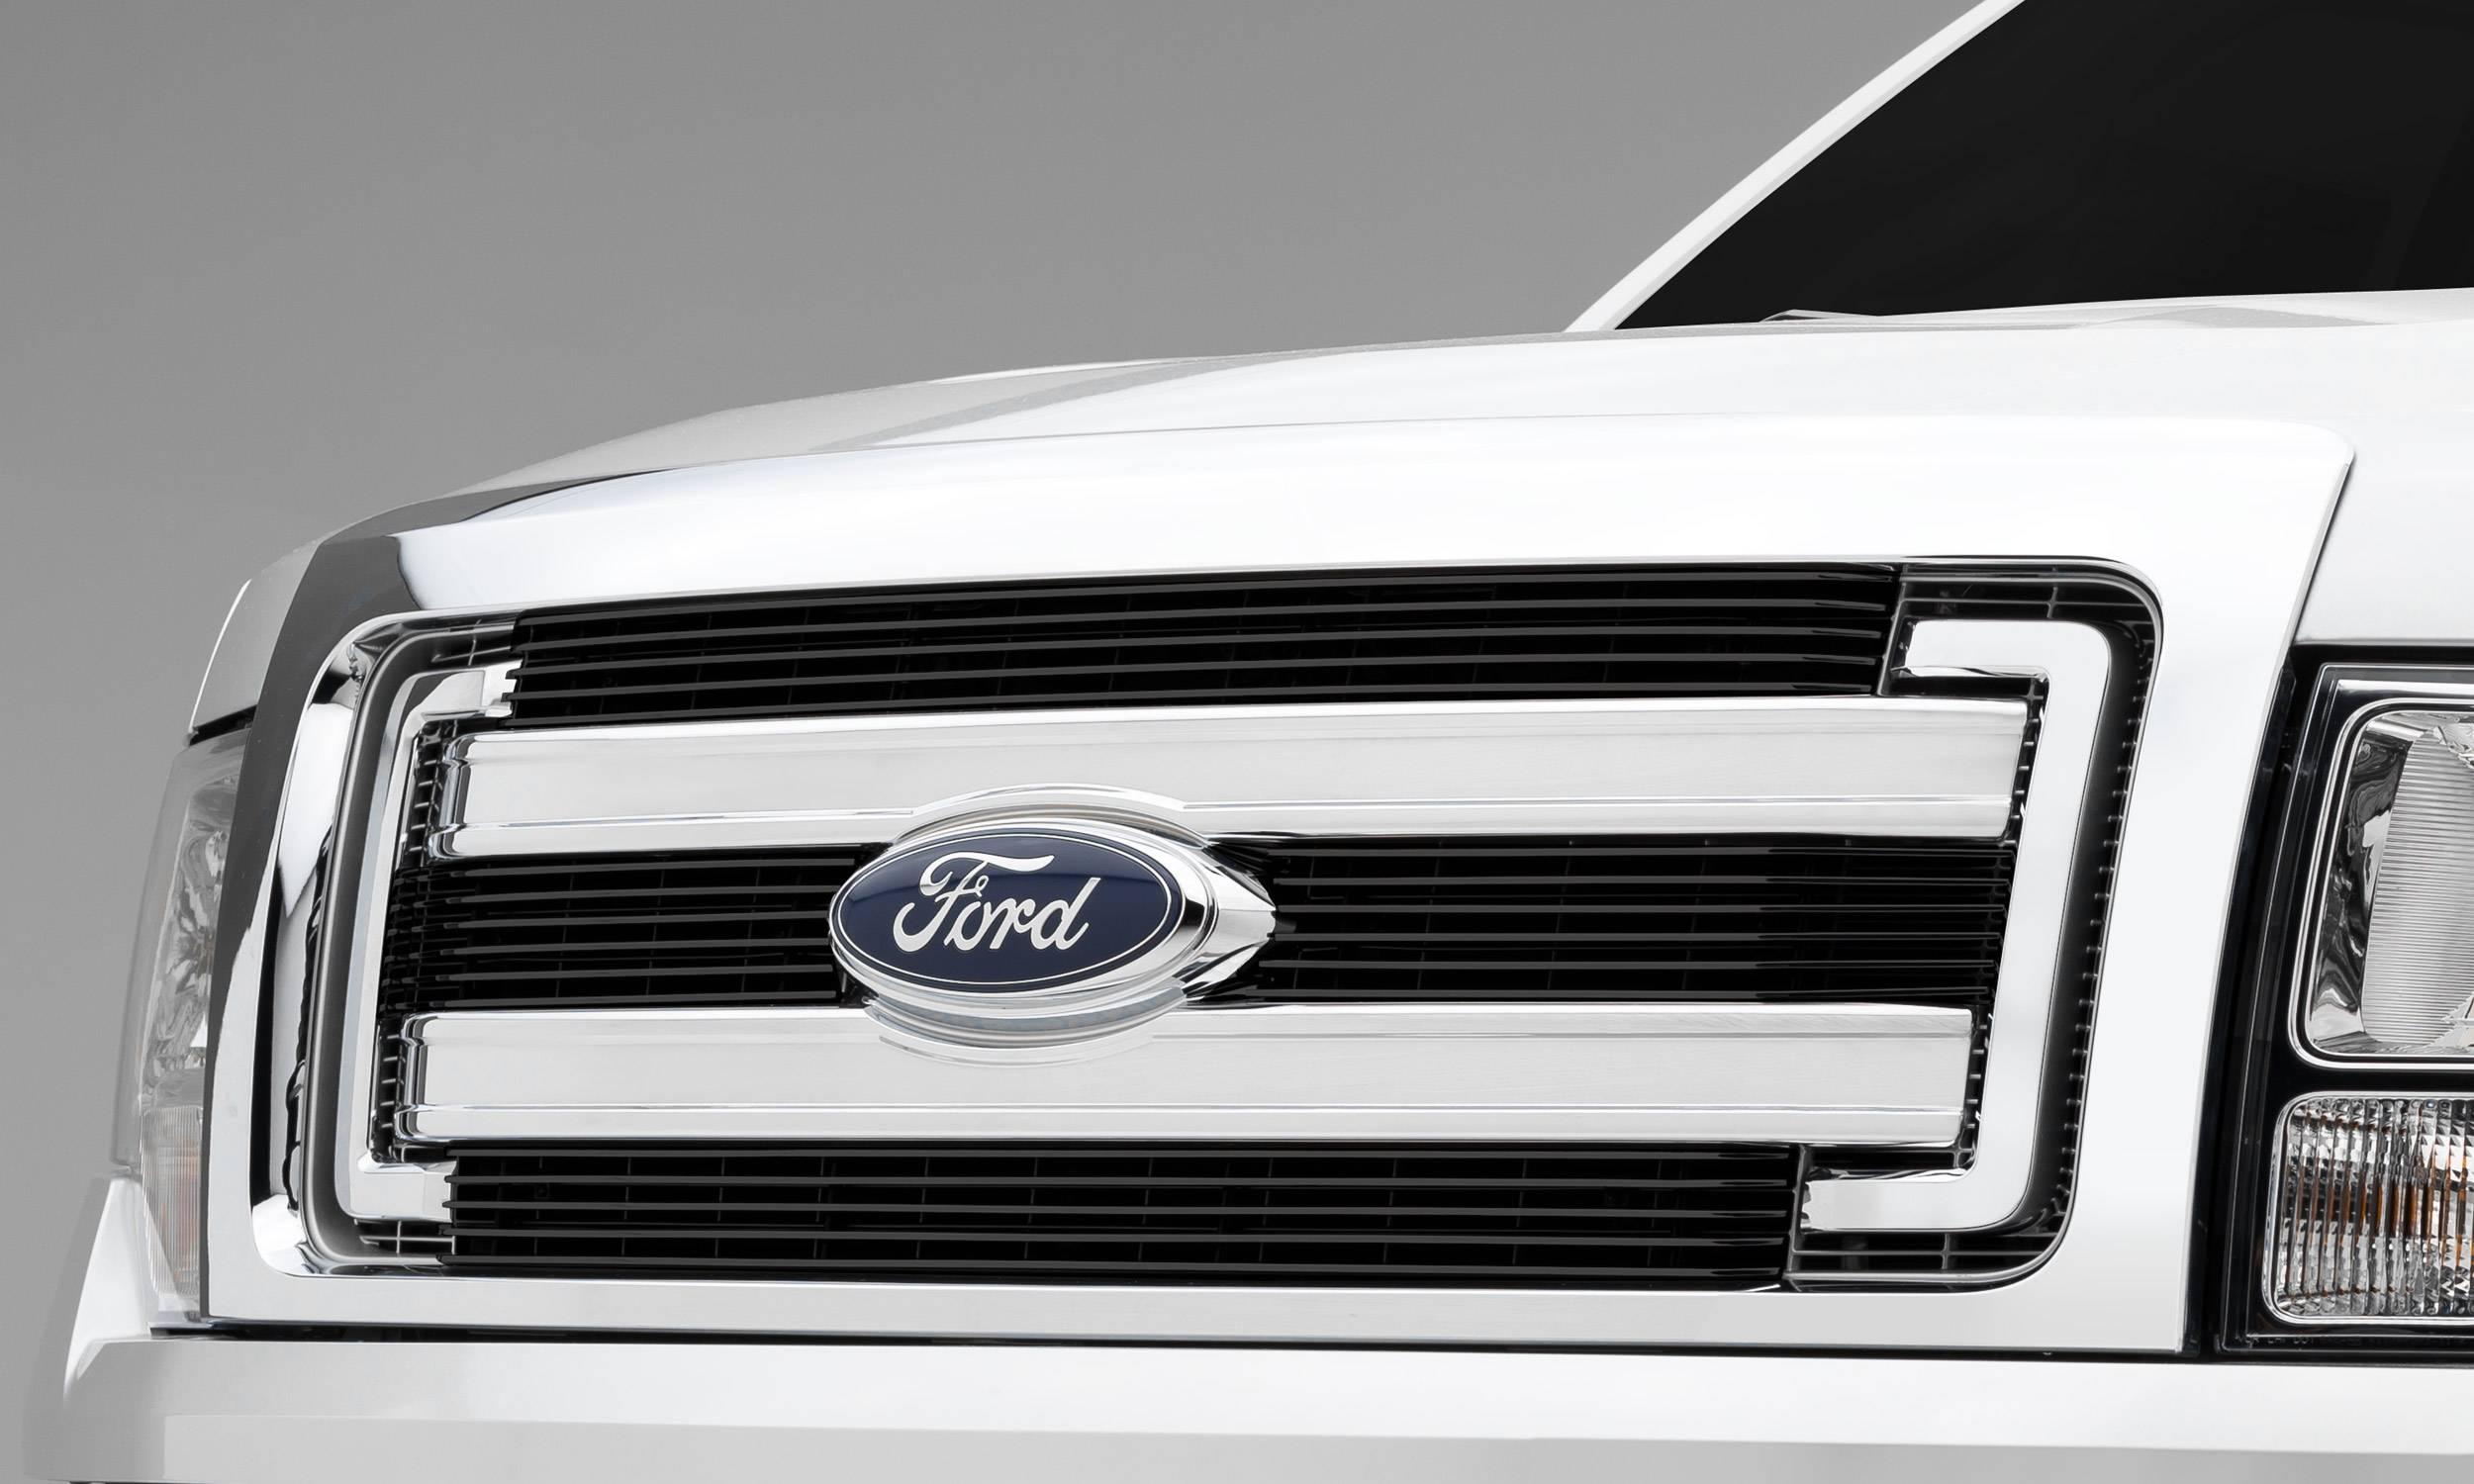 Ford F150 Xlt Billet Grille Main Overlay 4 Pc S Black Powder Coating Aluminum Bars